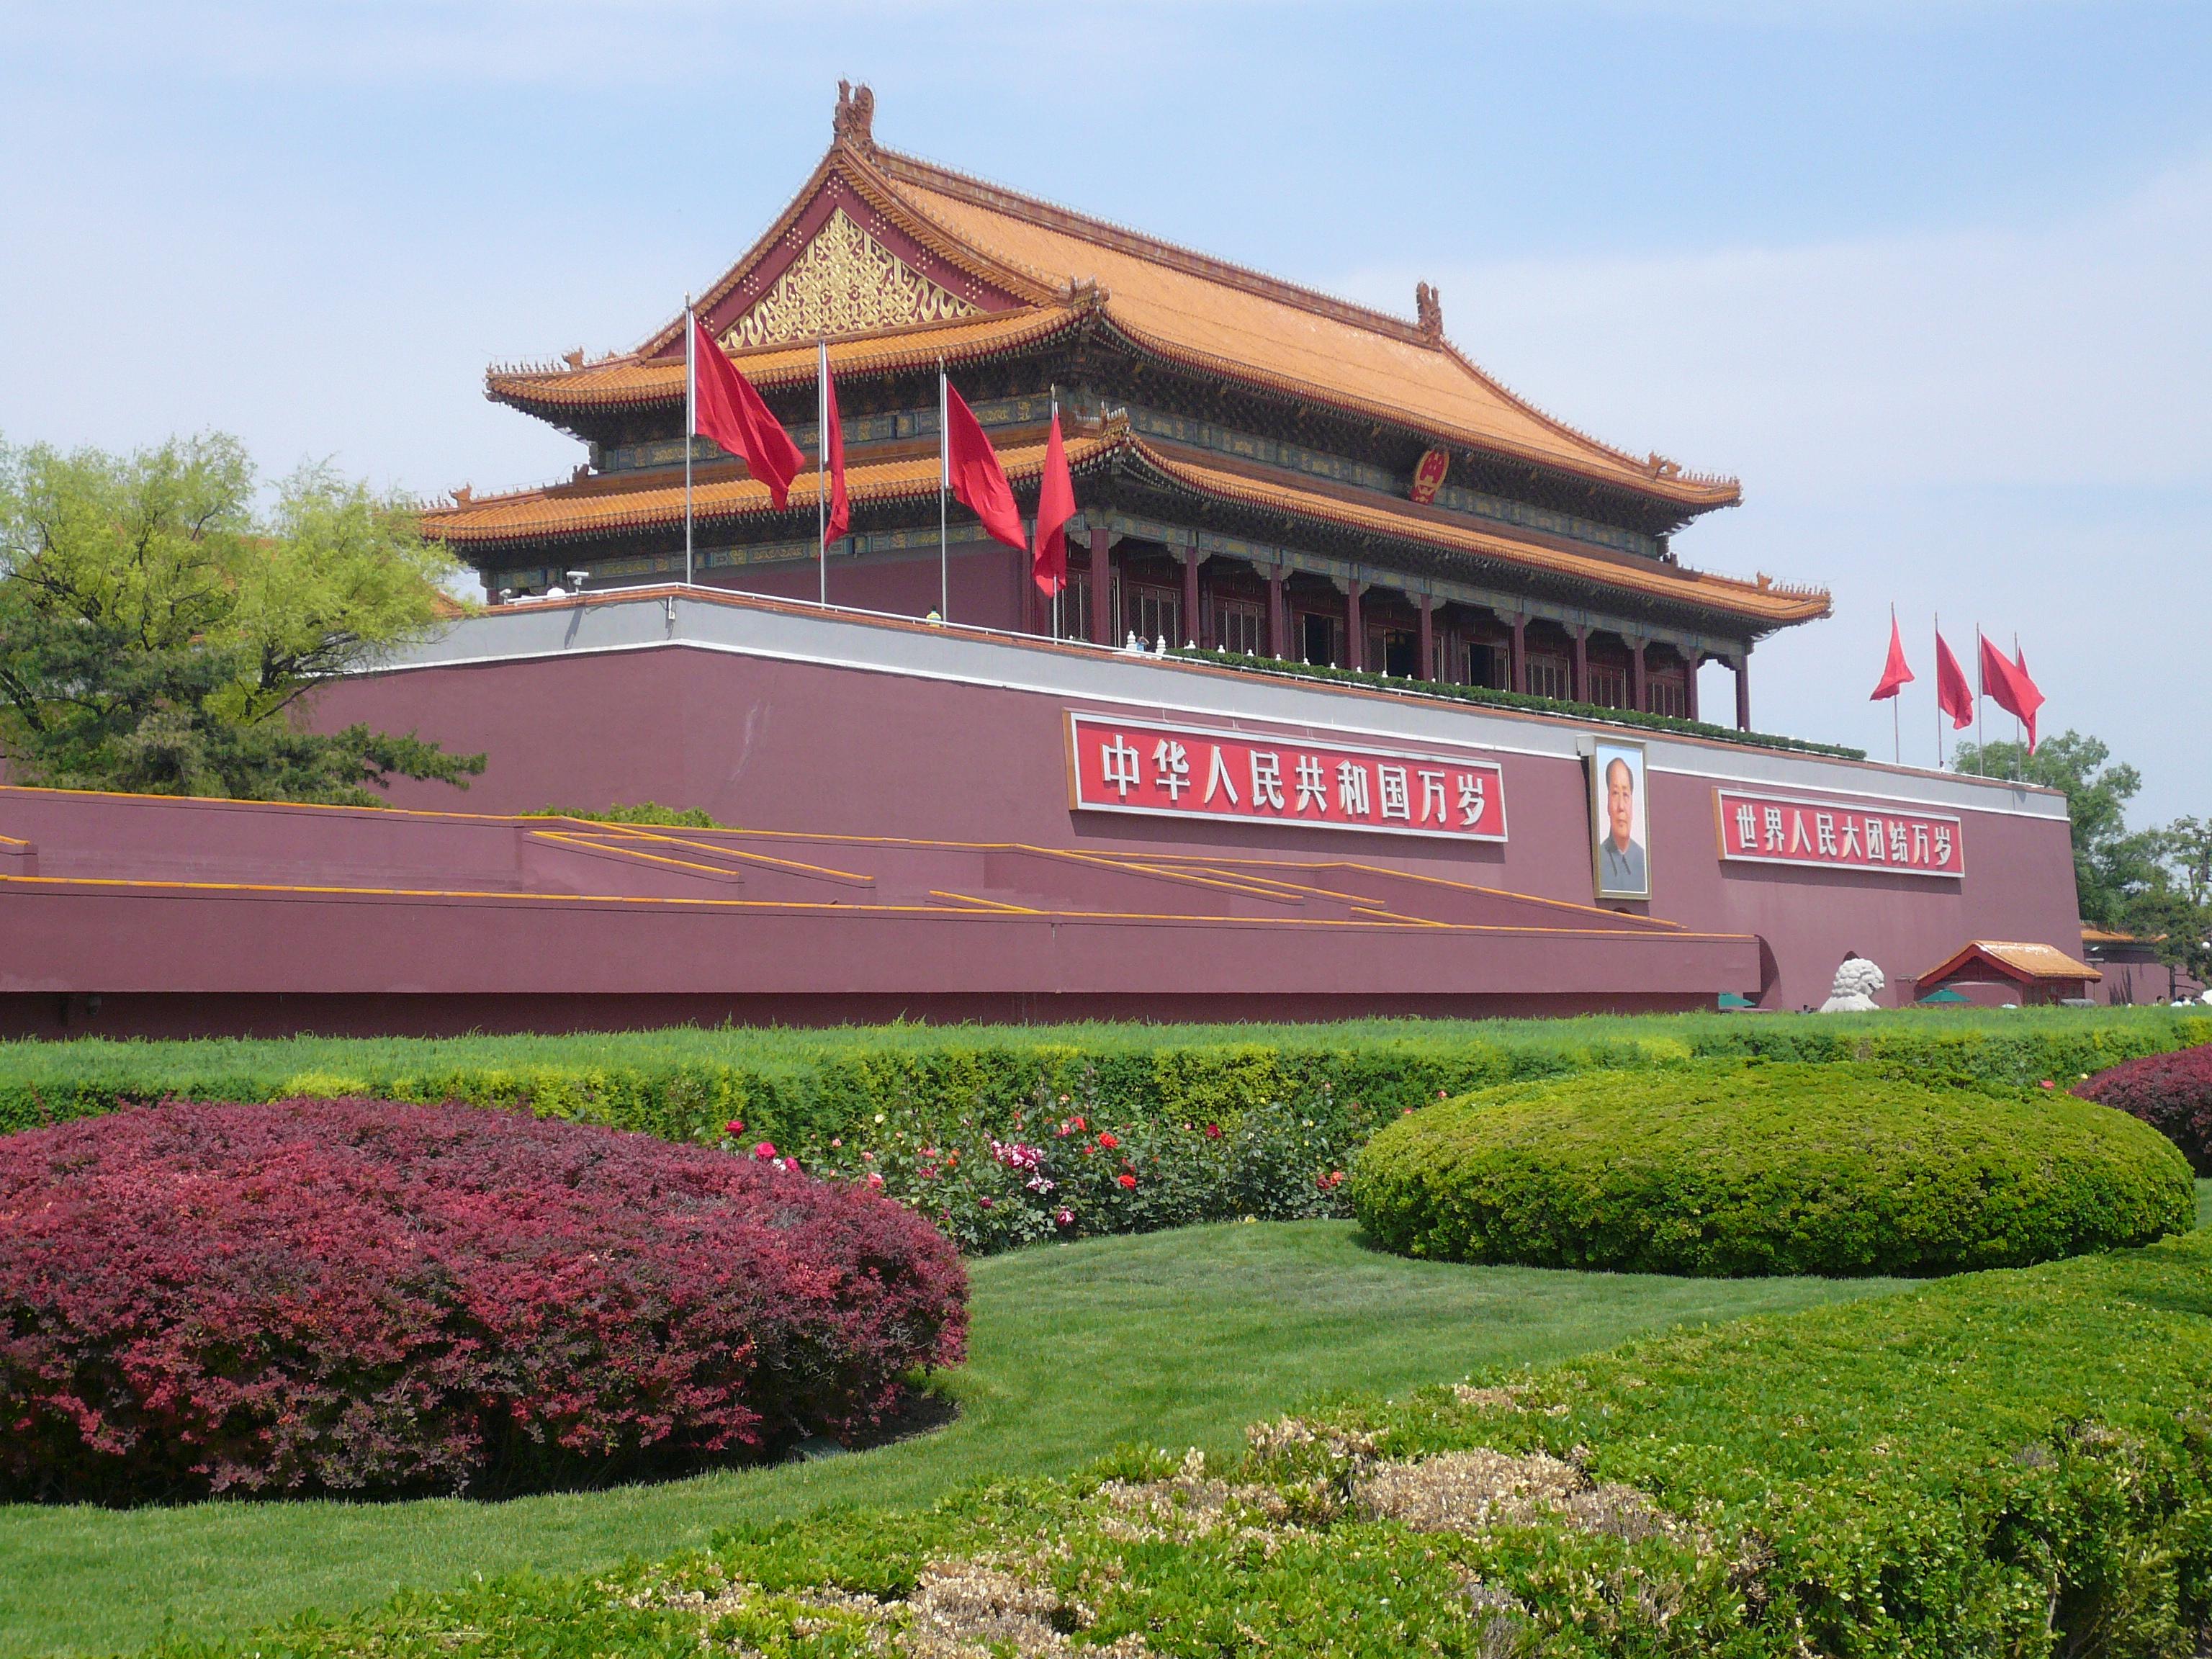 Image:Tiananmen.JPG